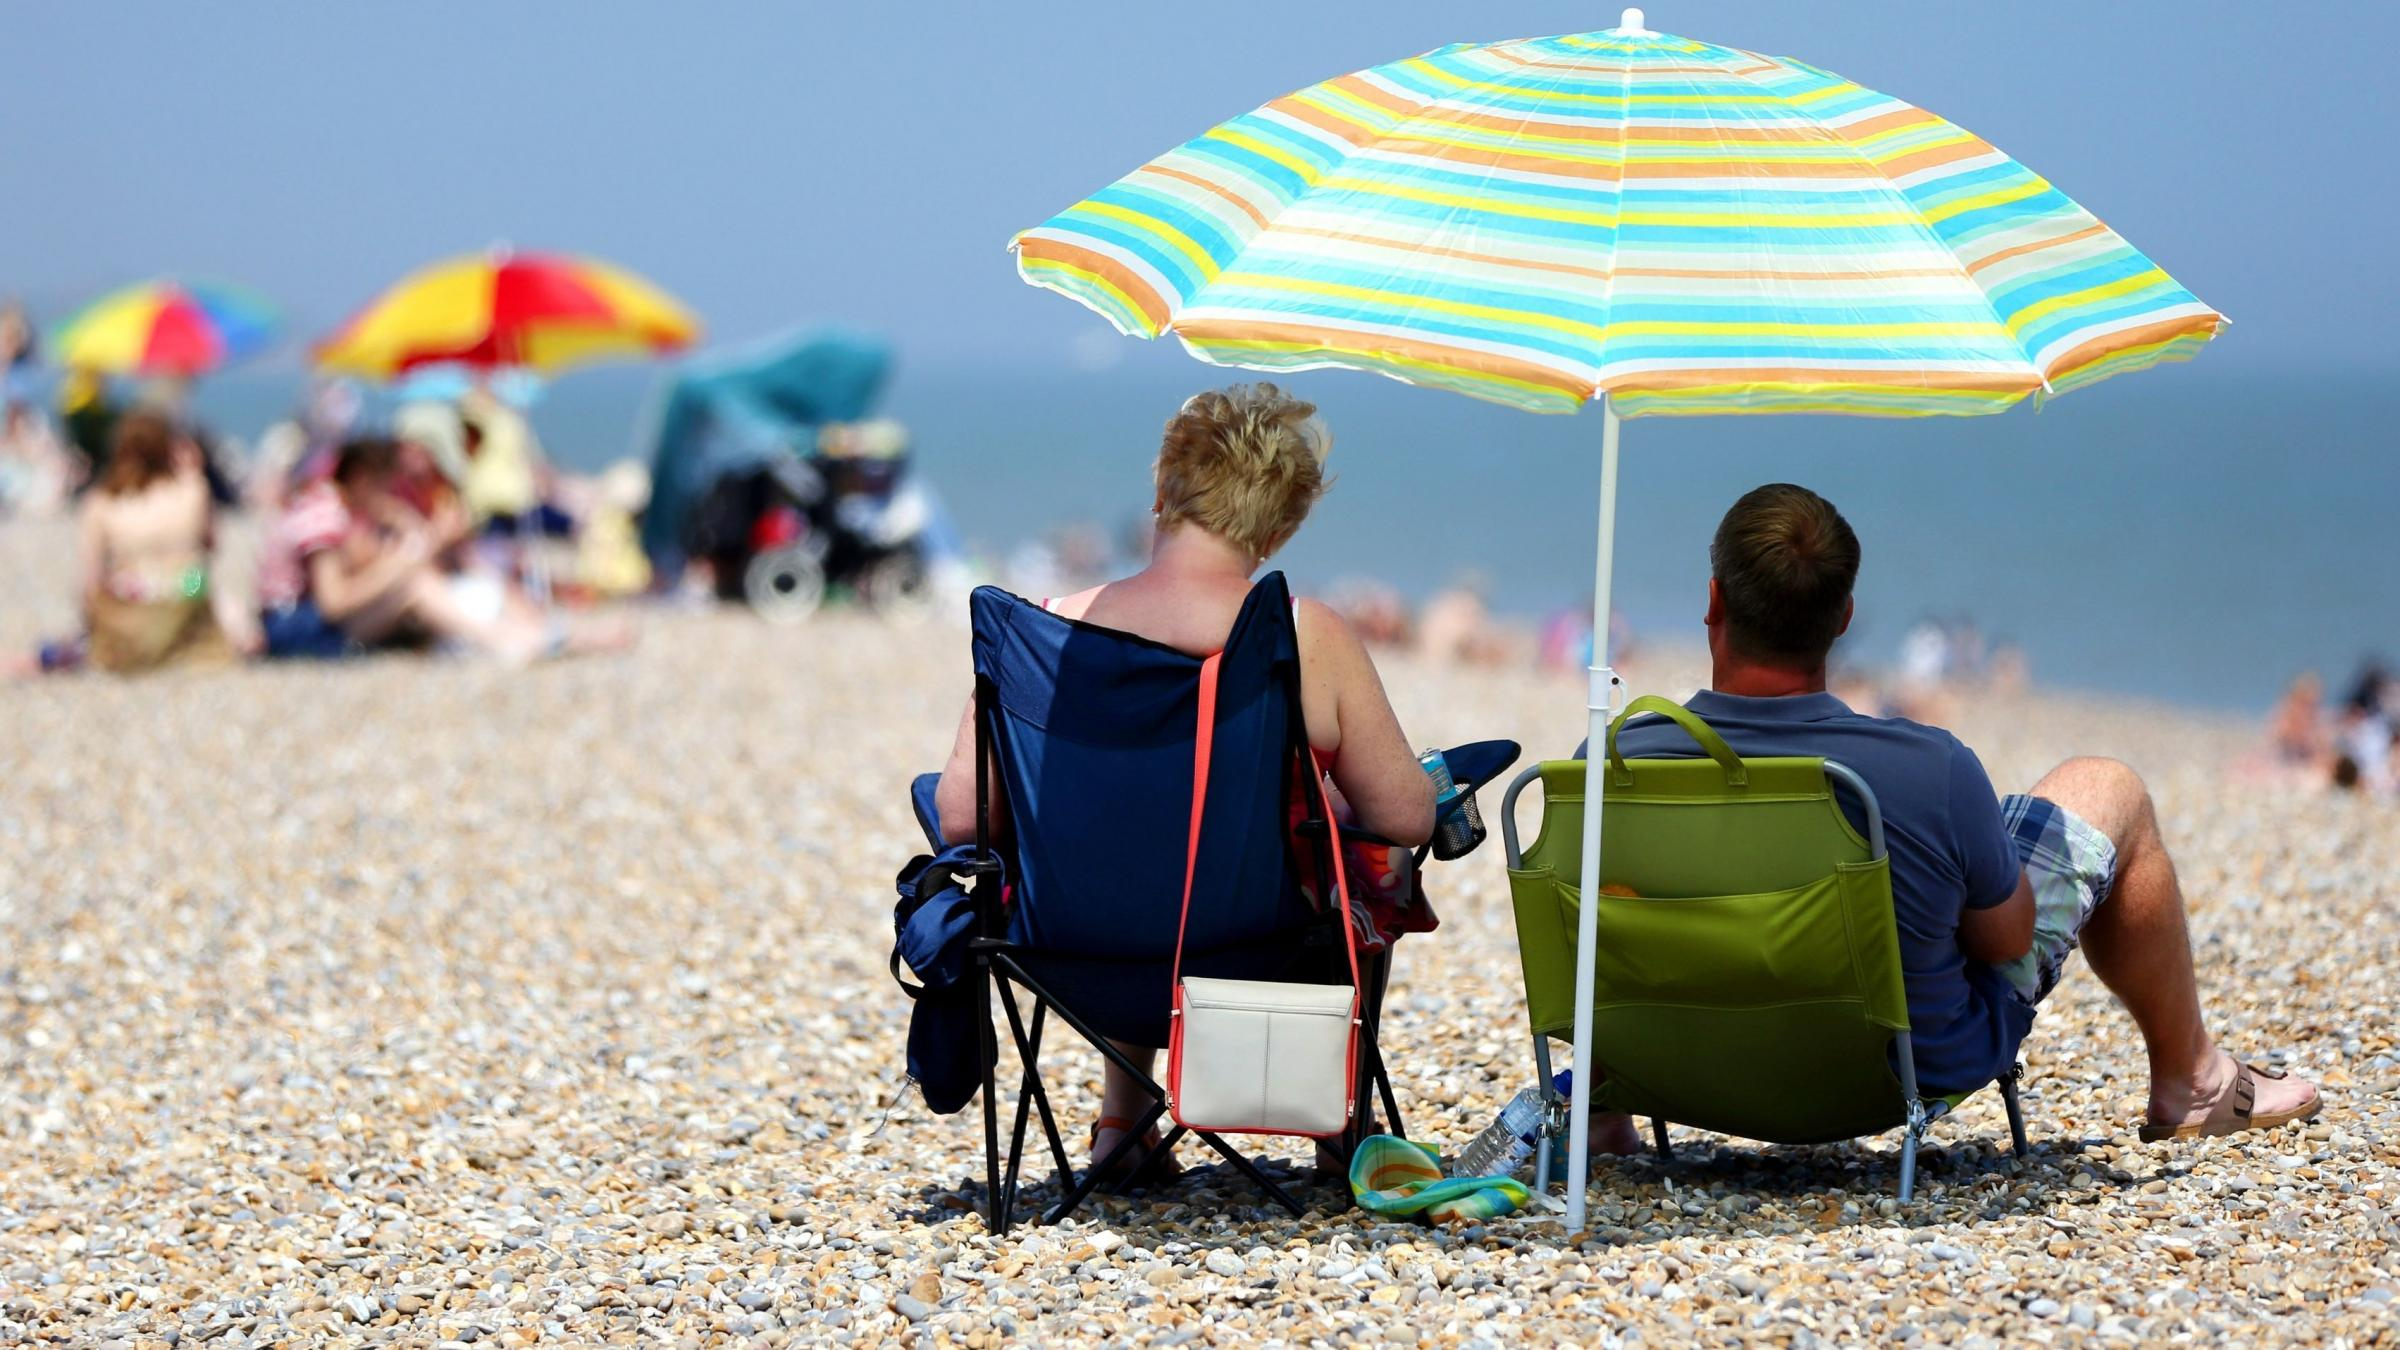 UK basks in blazing sunshine as heatwave continues